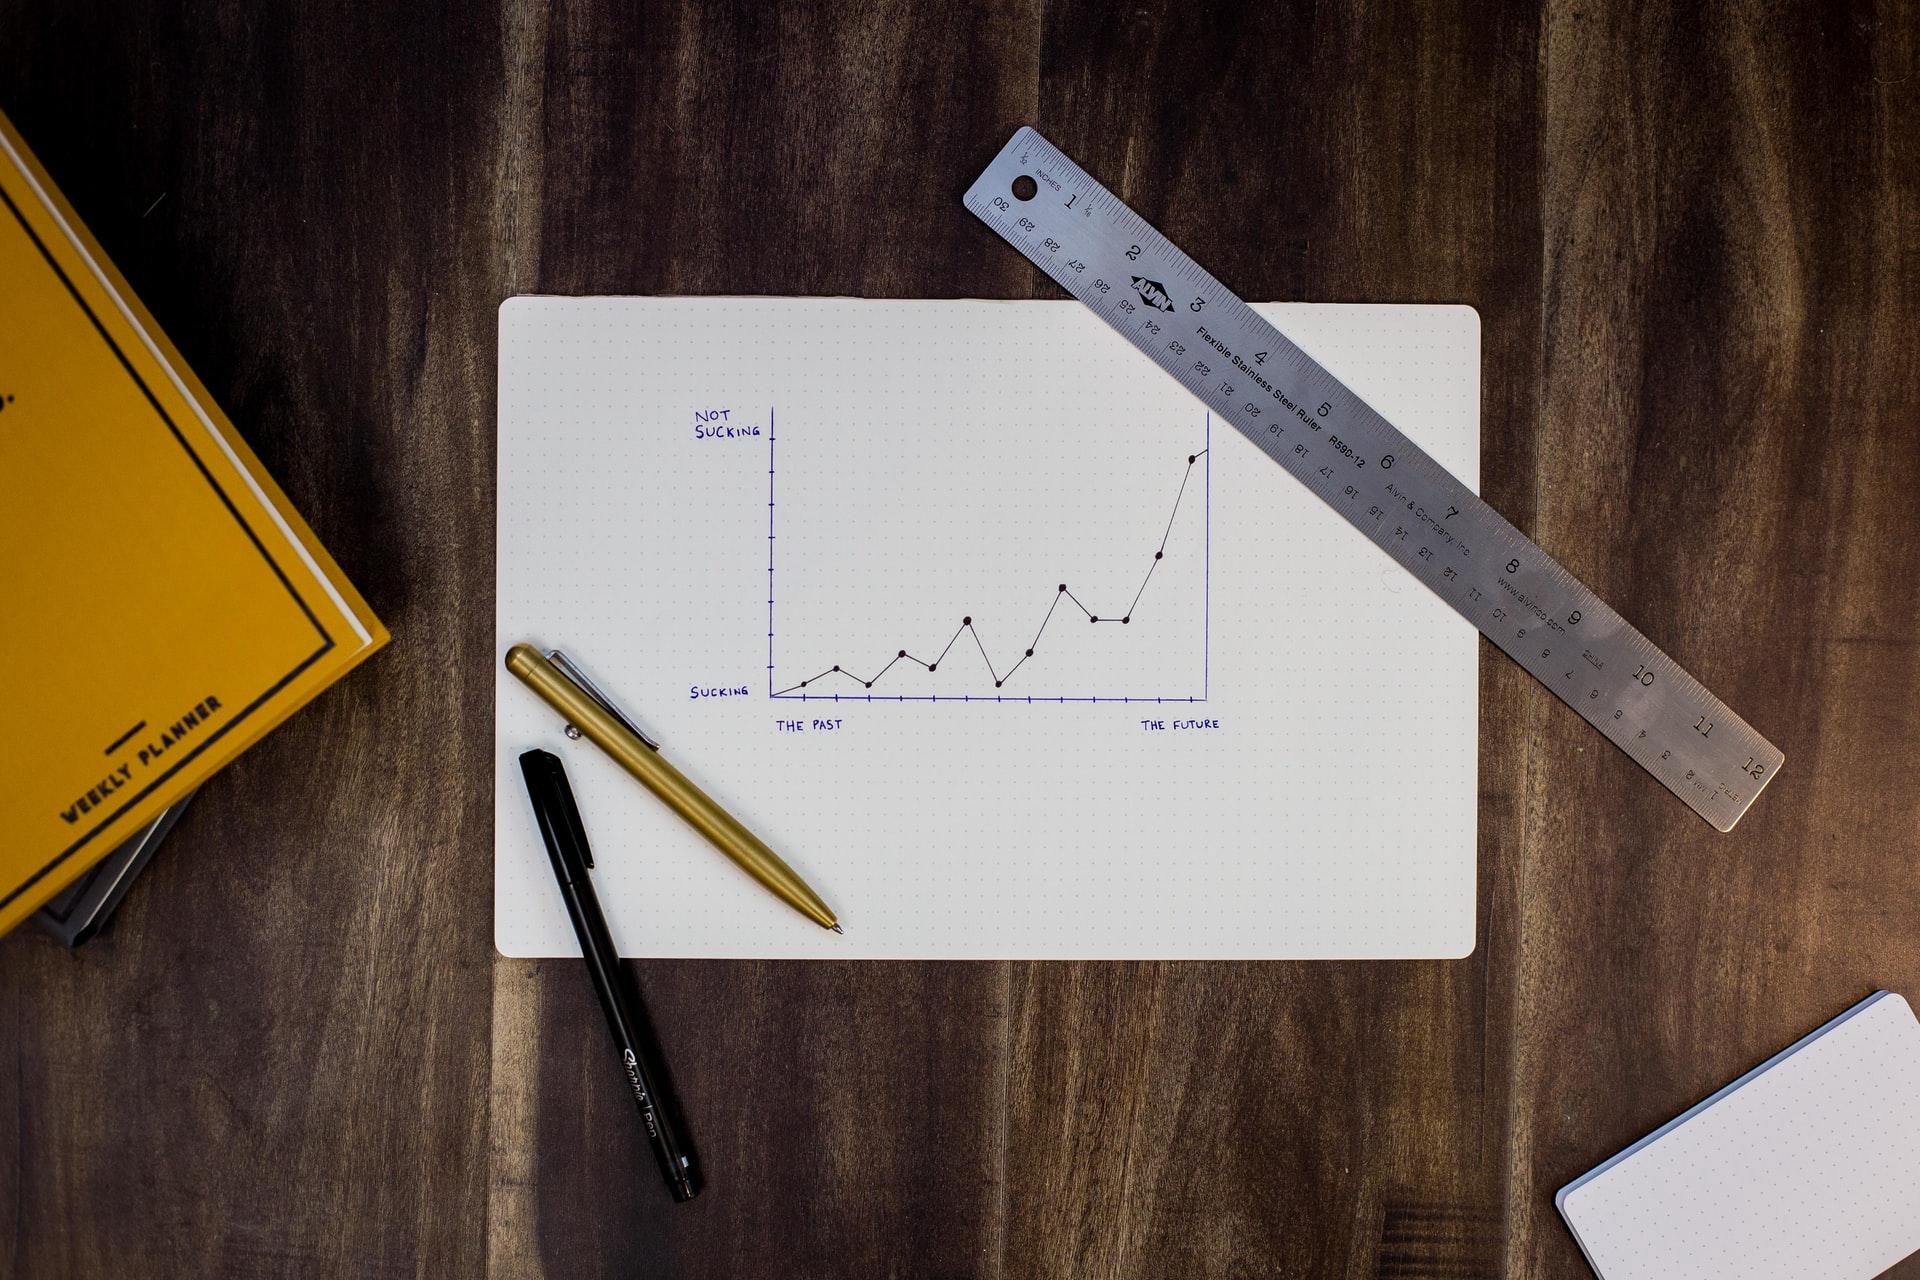 performcance planning chart